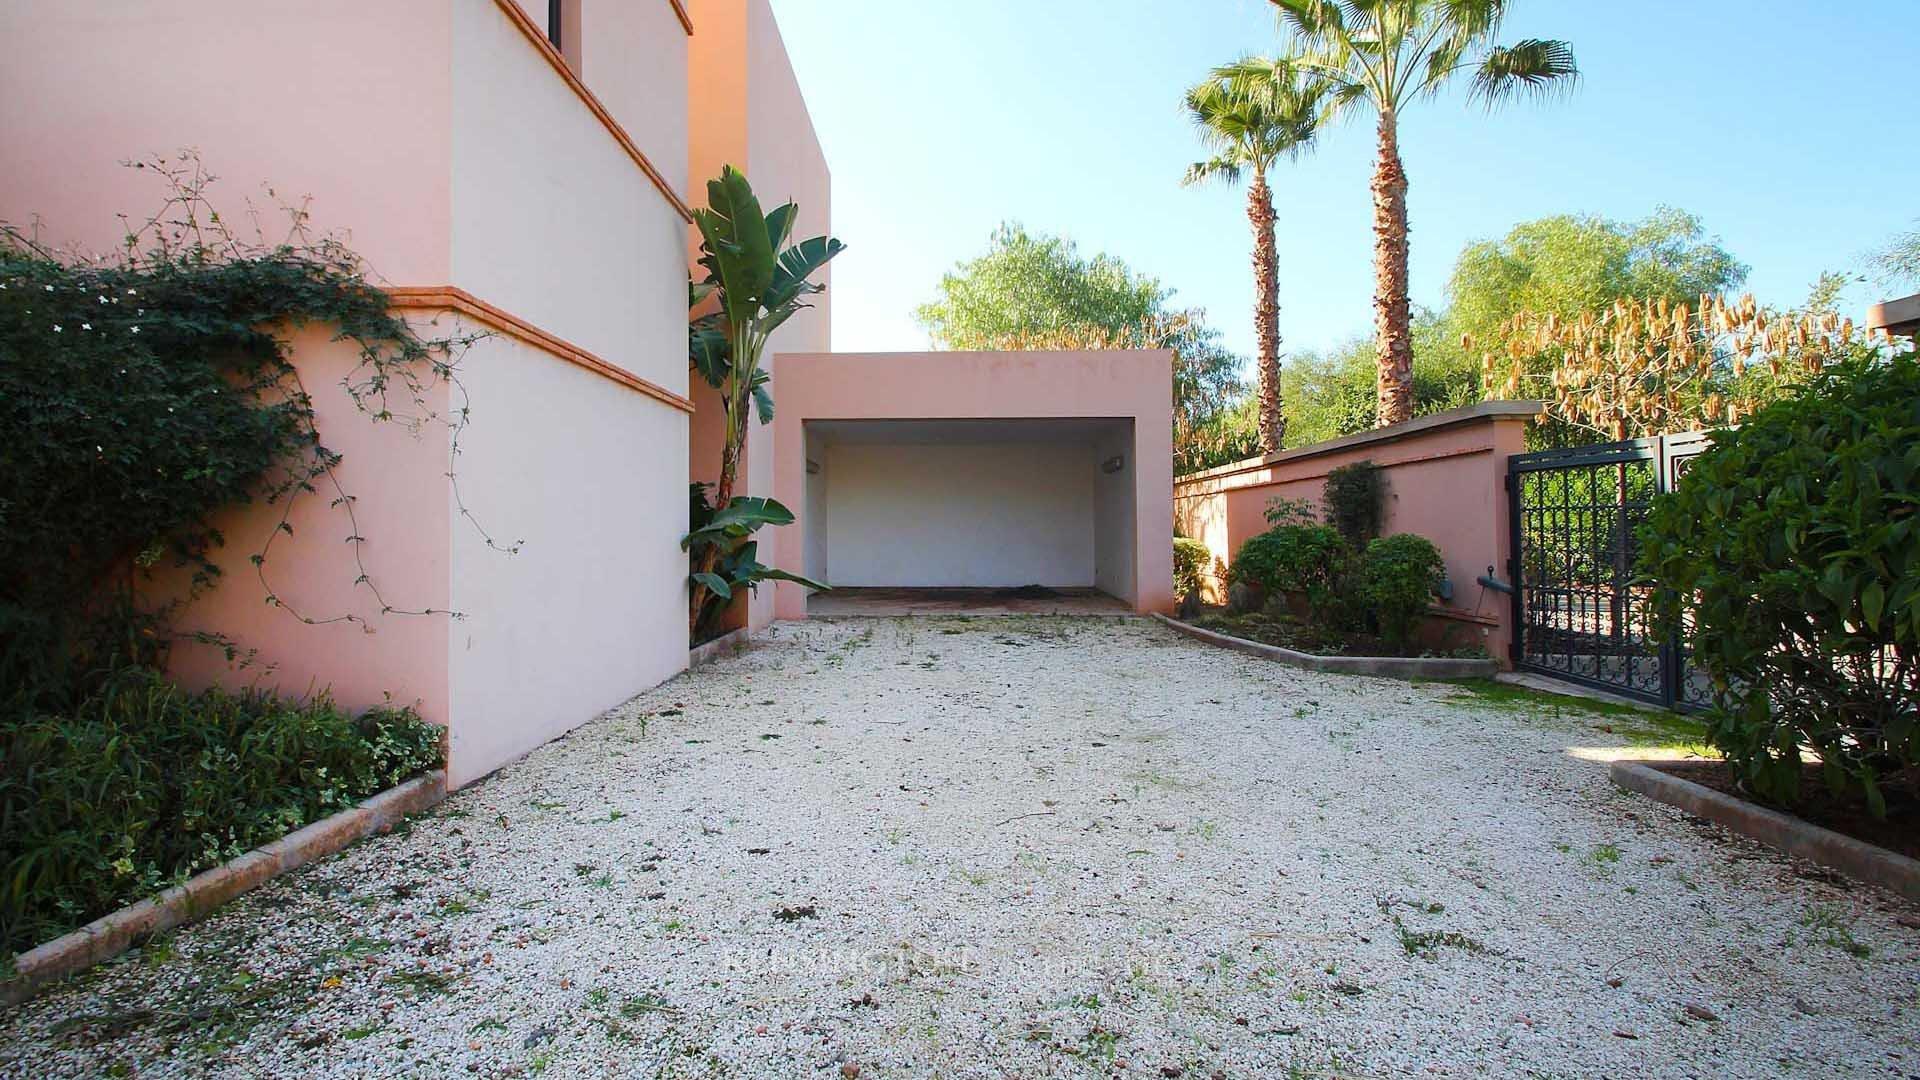 KPPM01142: Villa Rigel Luxury Villa Marrakech Morocco